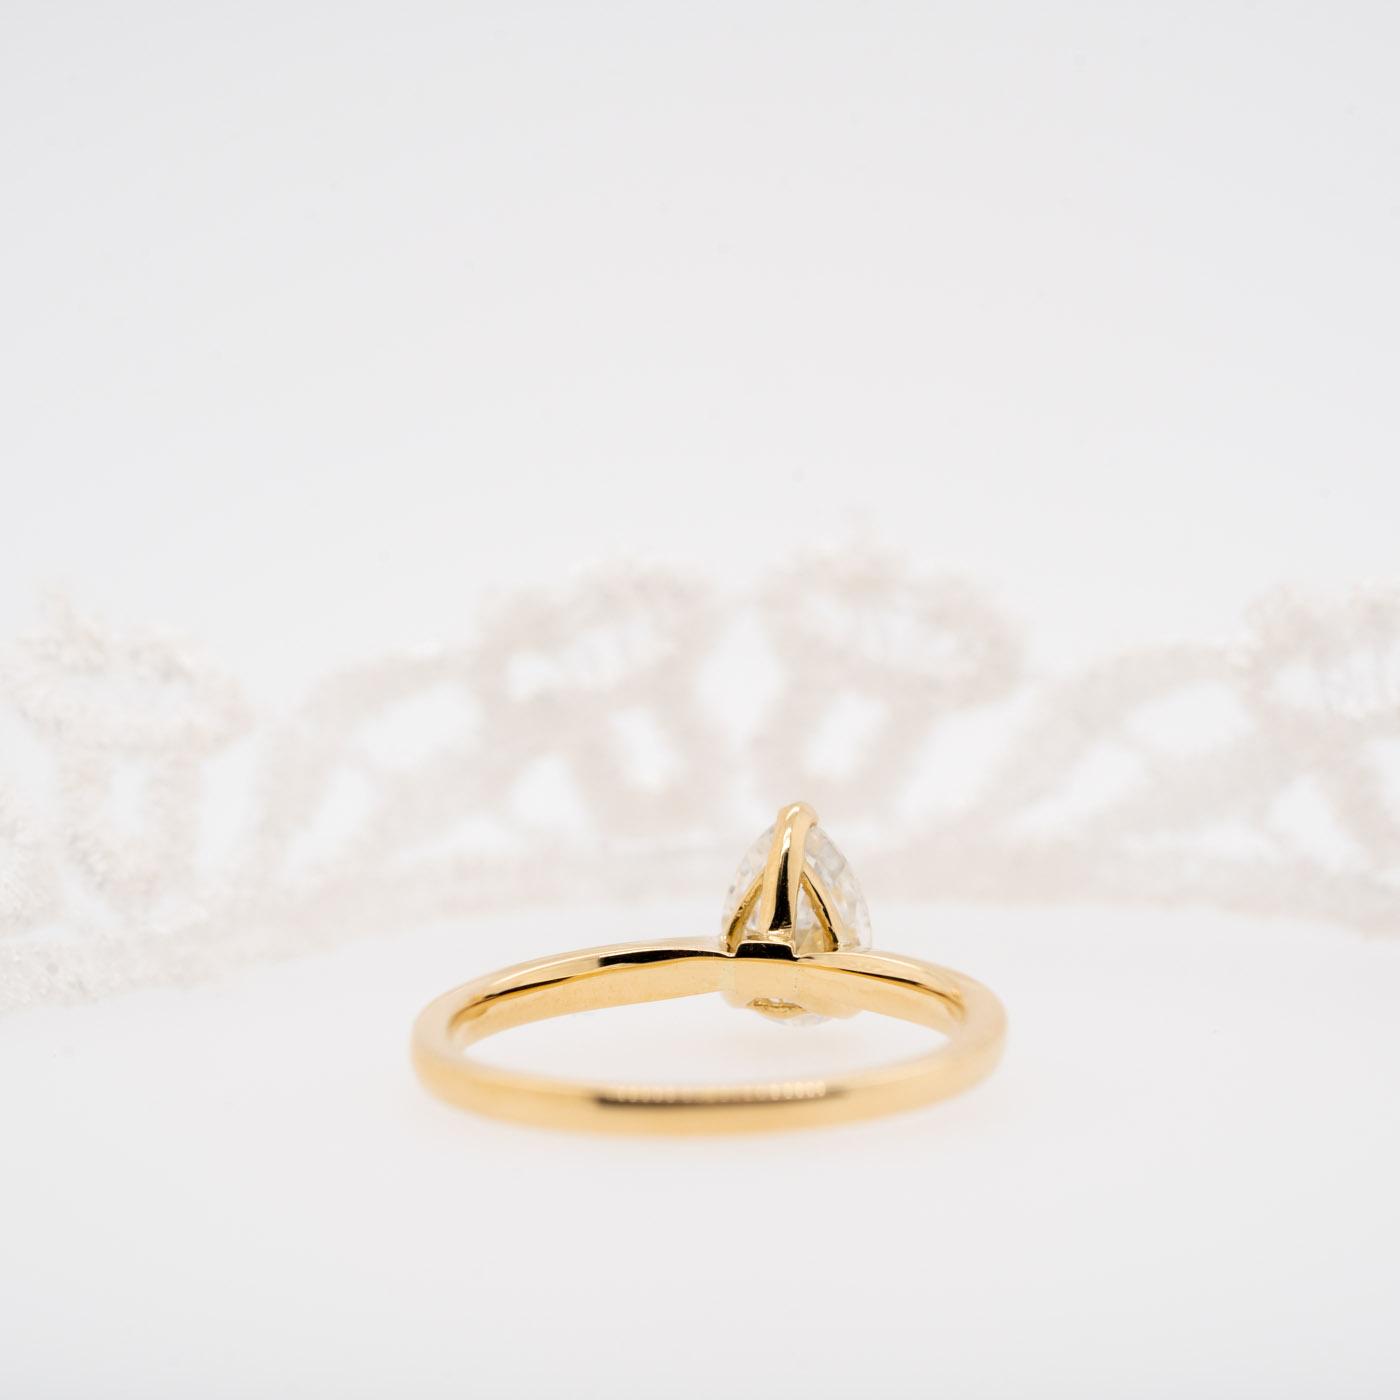 Pear Cut Diamond Engagement Ring | Ali | Ethica Diamonds UK